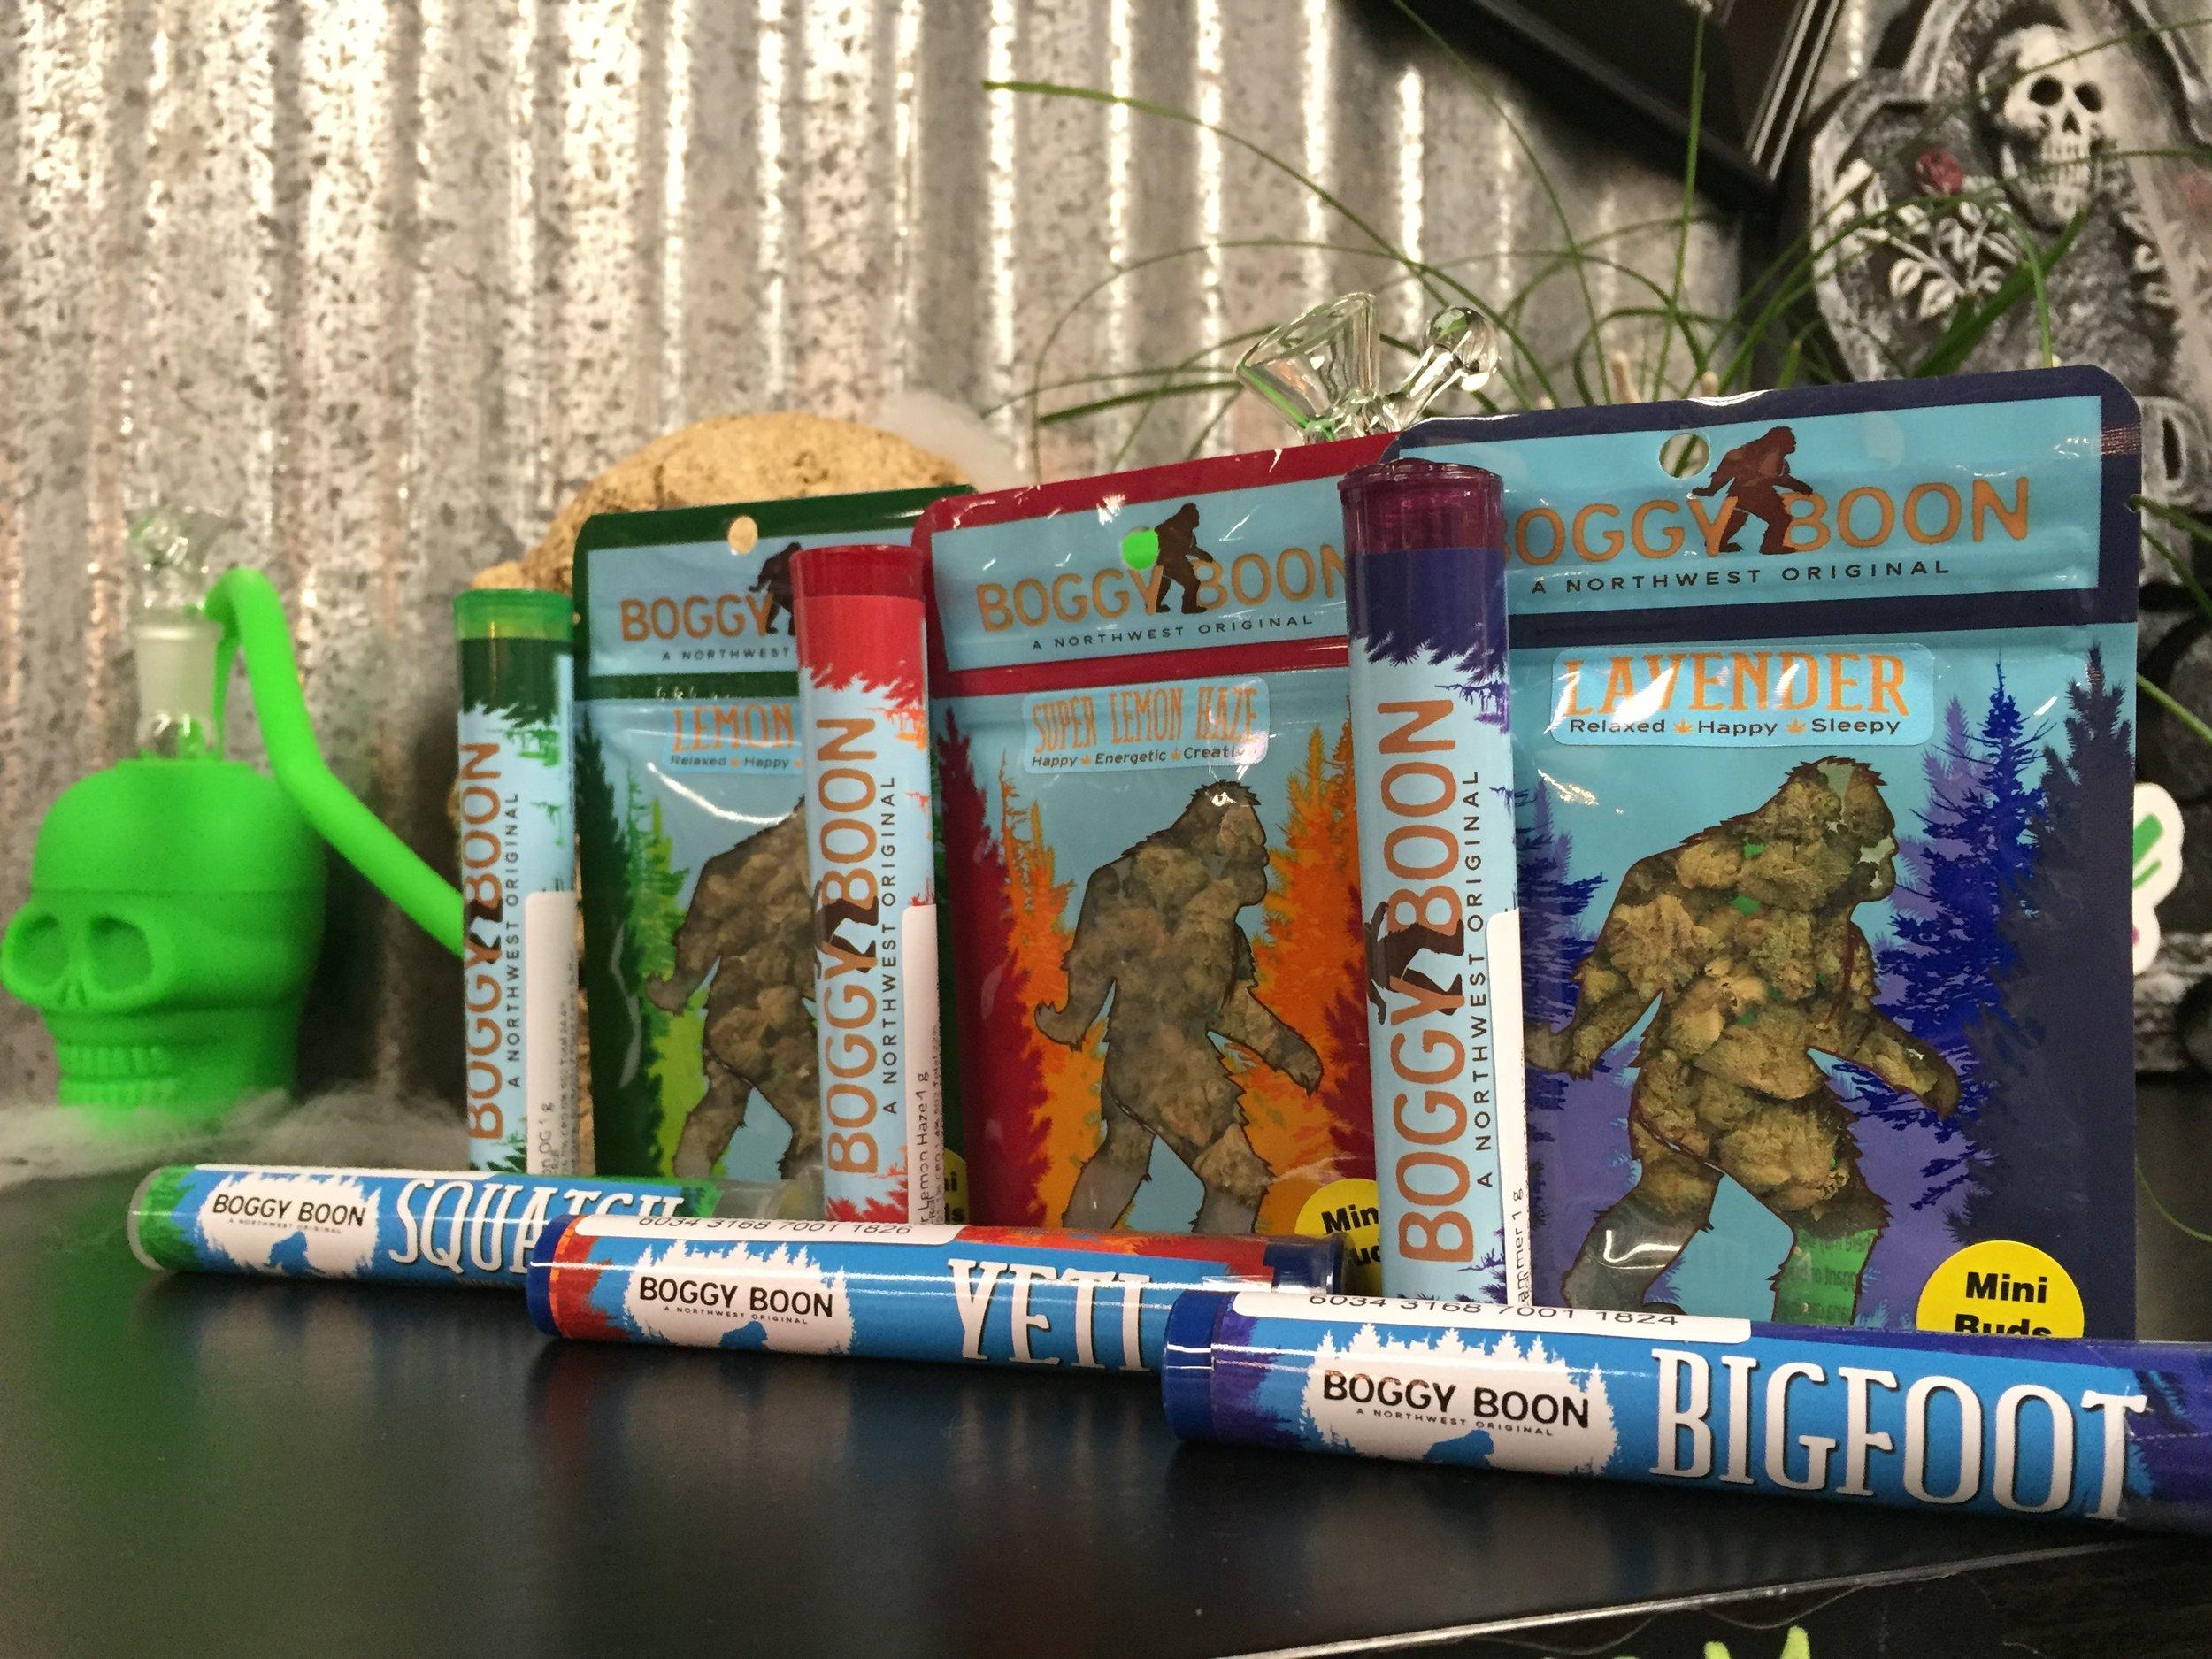 Boggy Boon- Marijuana Flower & Prerolled Joints